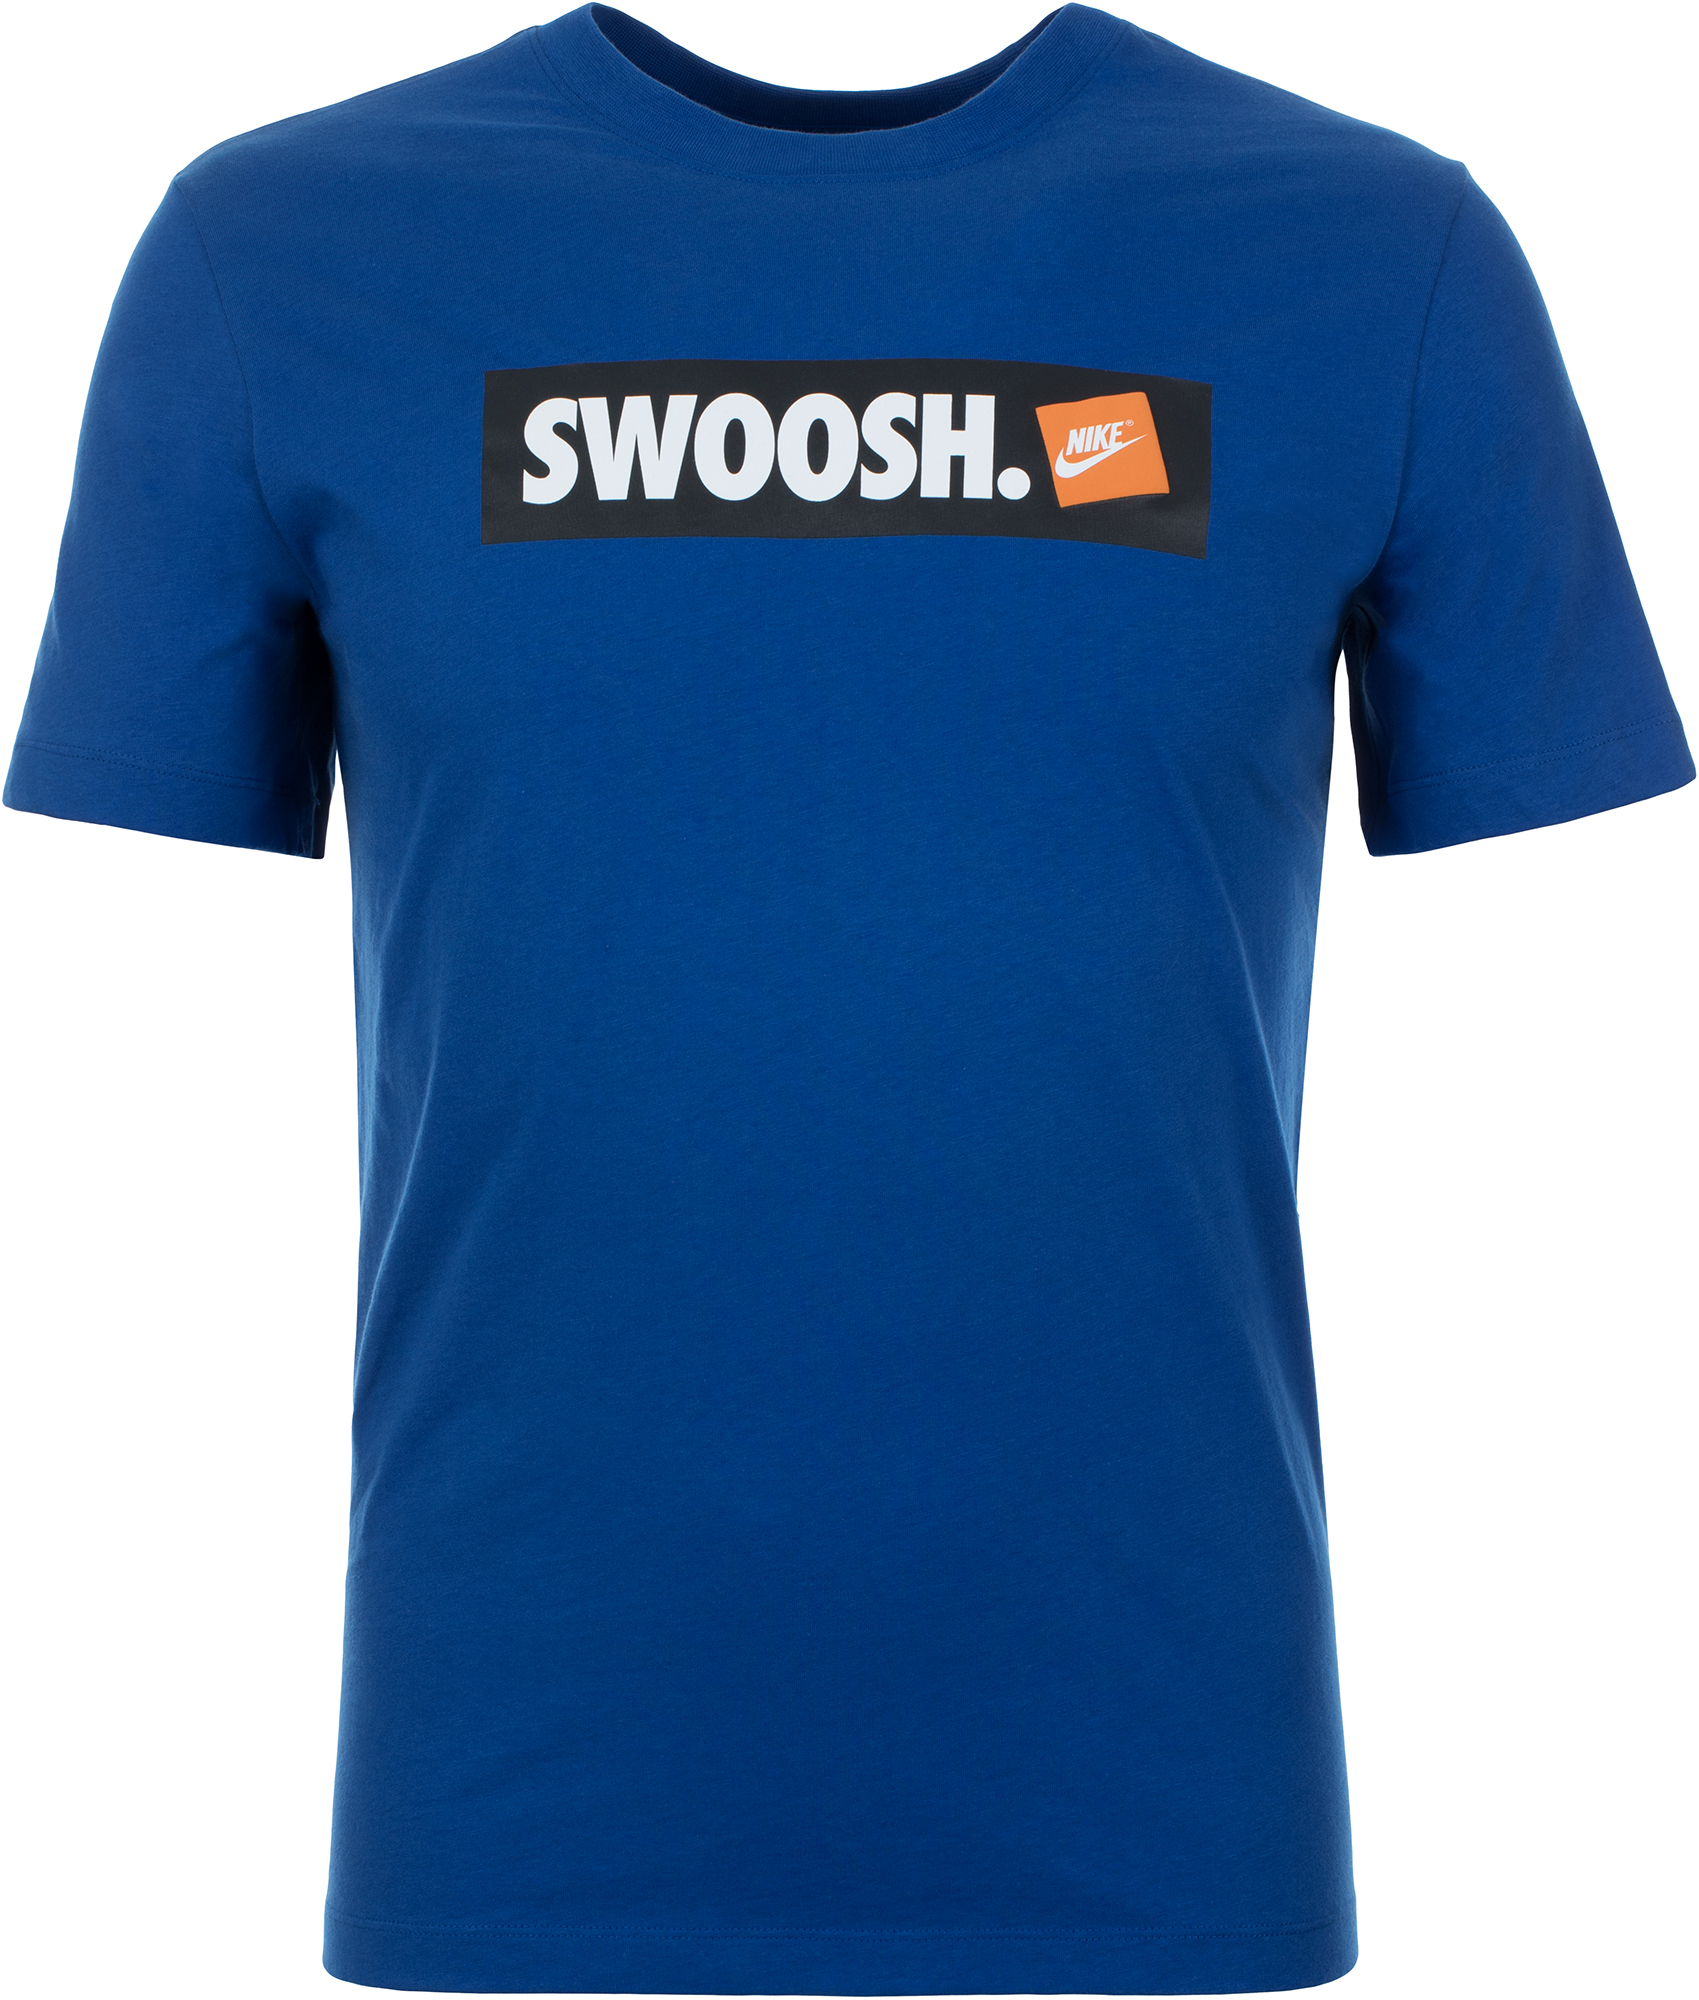 Nike Футболка мужская Nike Sportswear Swoosh, размер 52-54